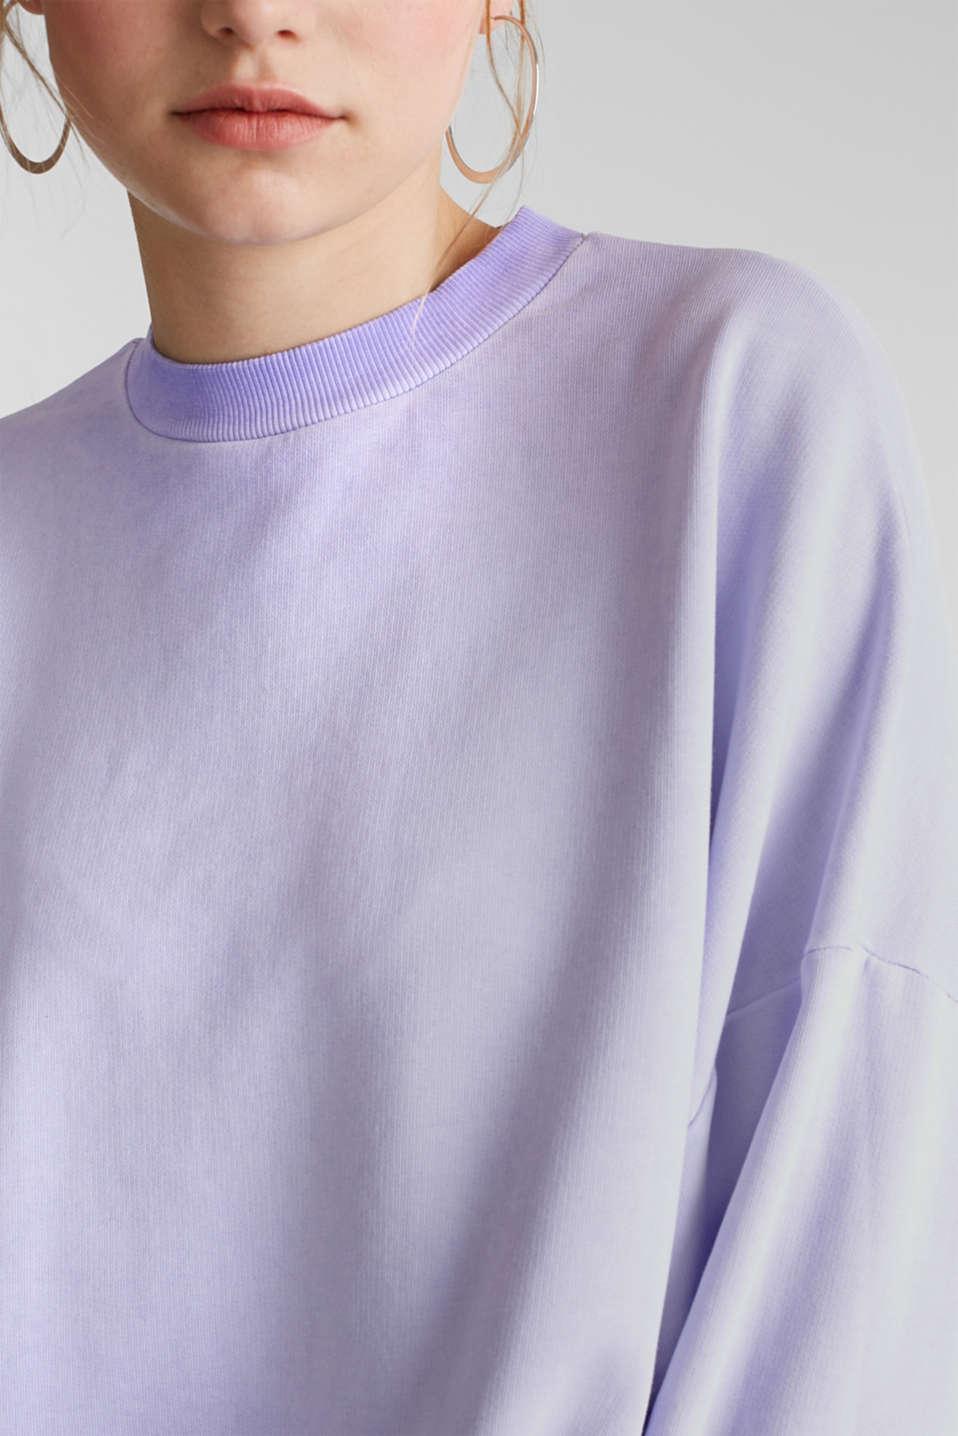 Sweatshirt with batwing sleeves, 100% cotton, DARK LAVENDER, detail image number 2